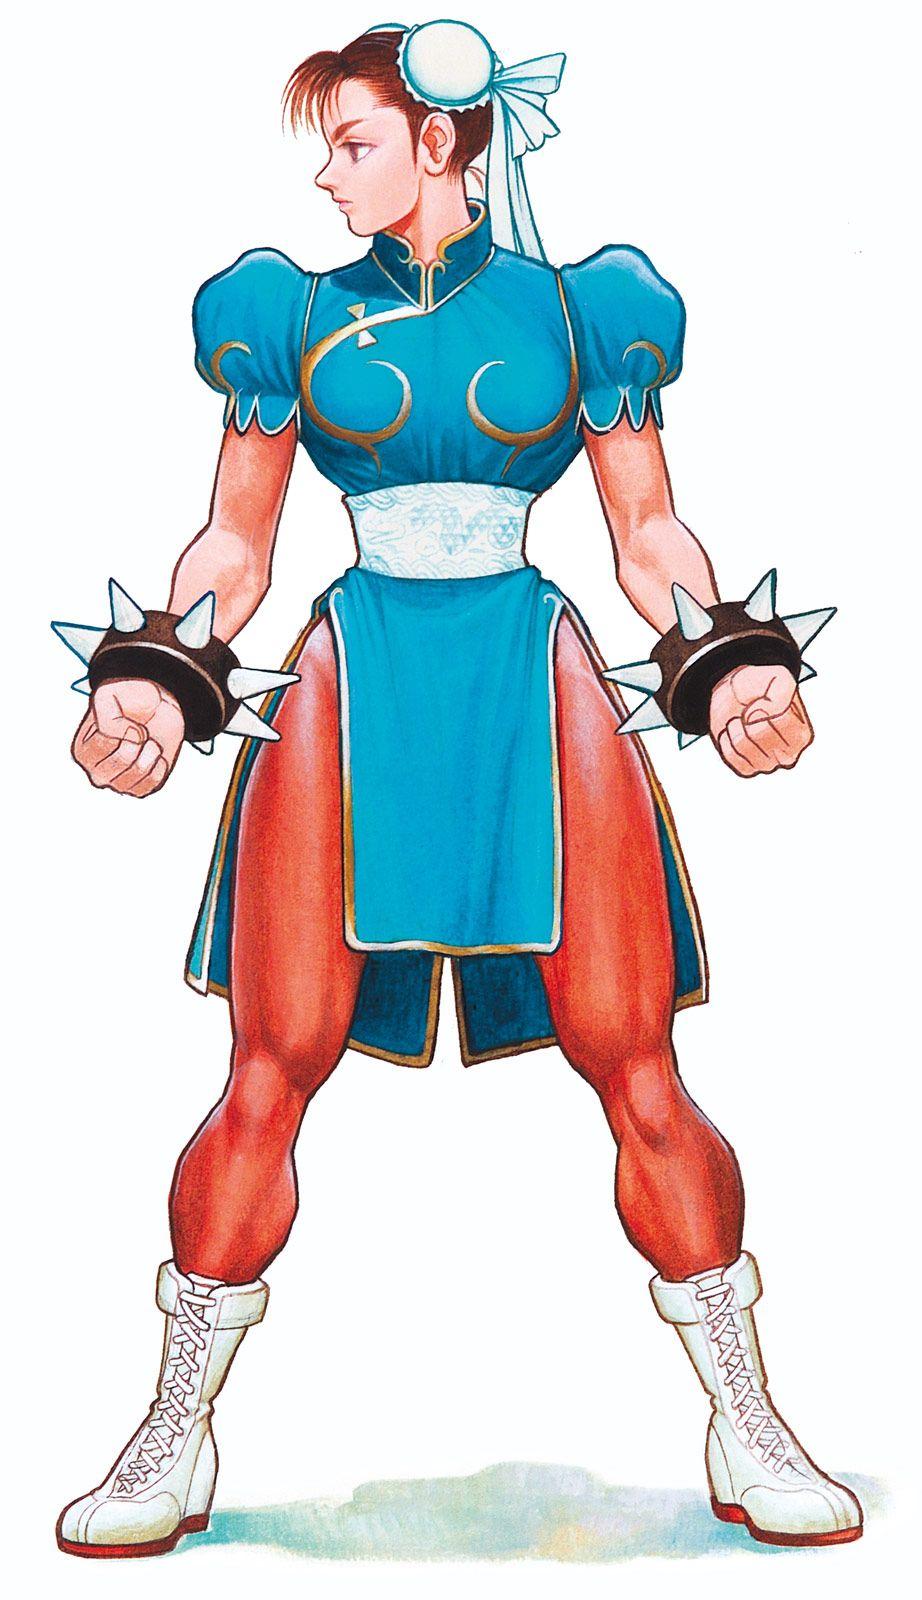 Chun Li Artwork 2 Street Fighter 2 High Resolution